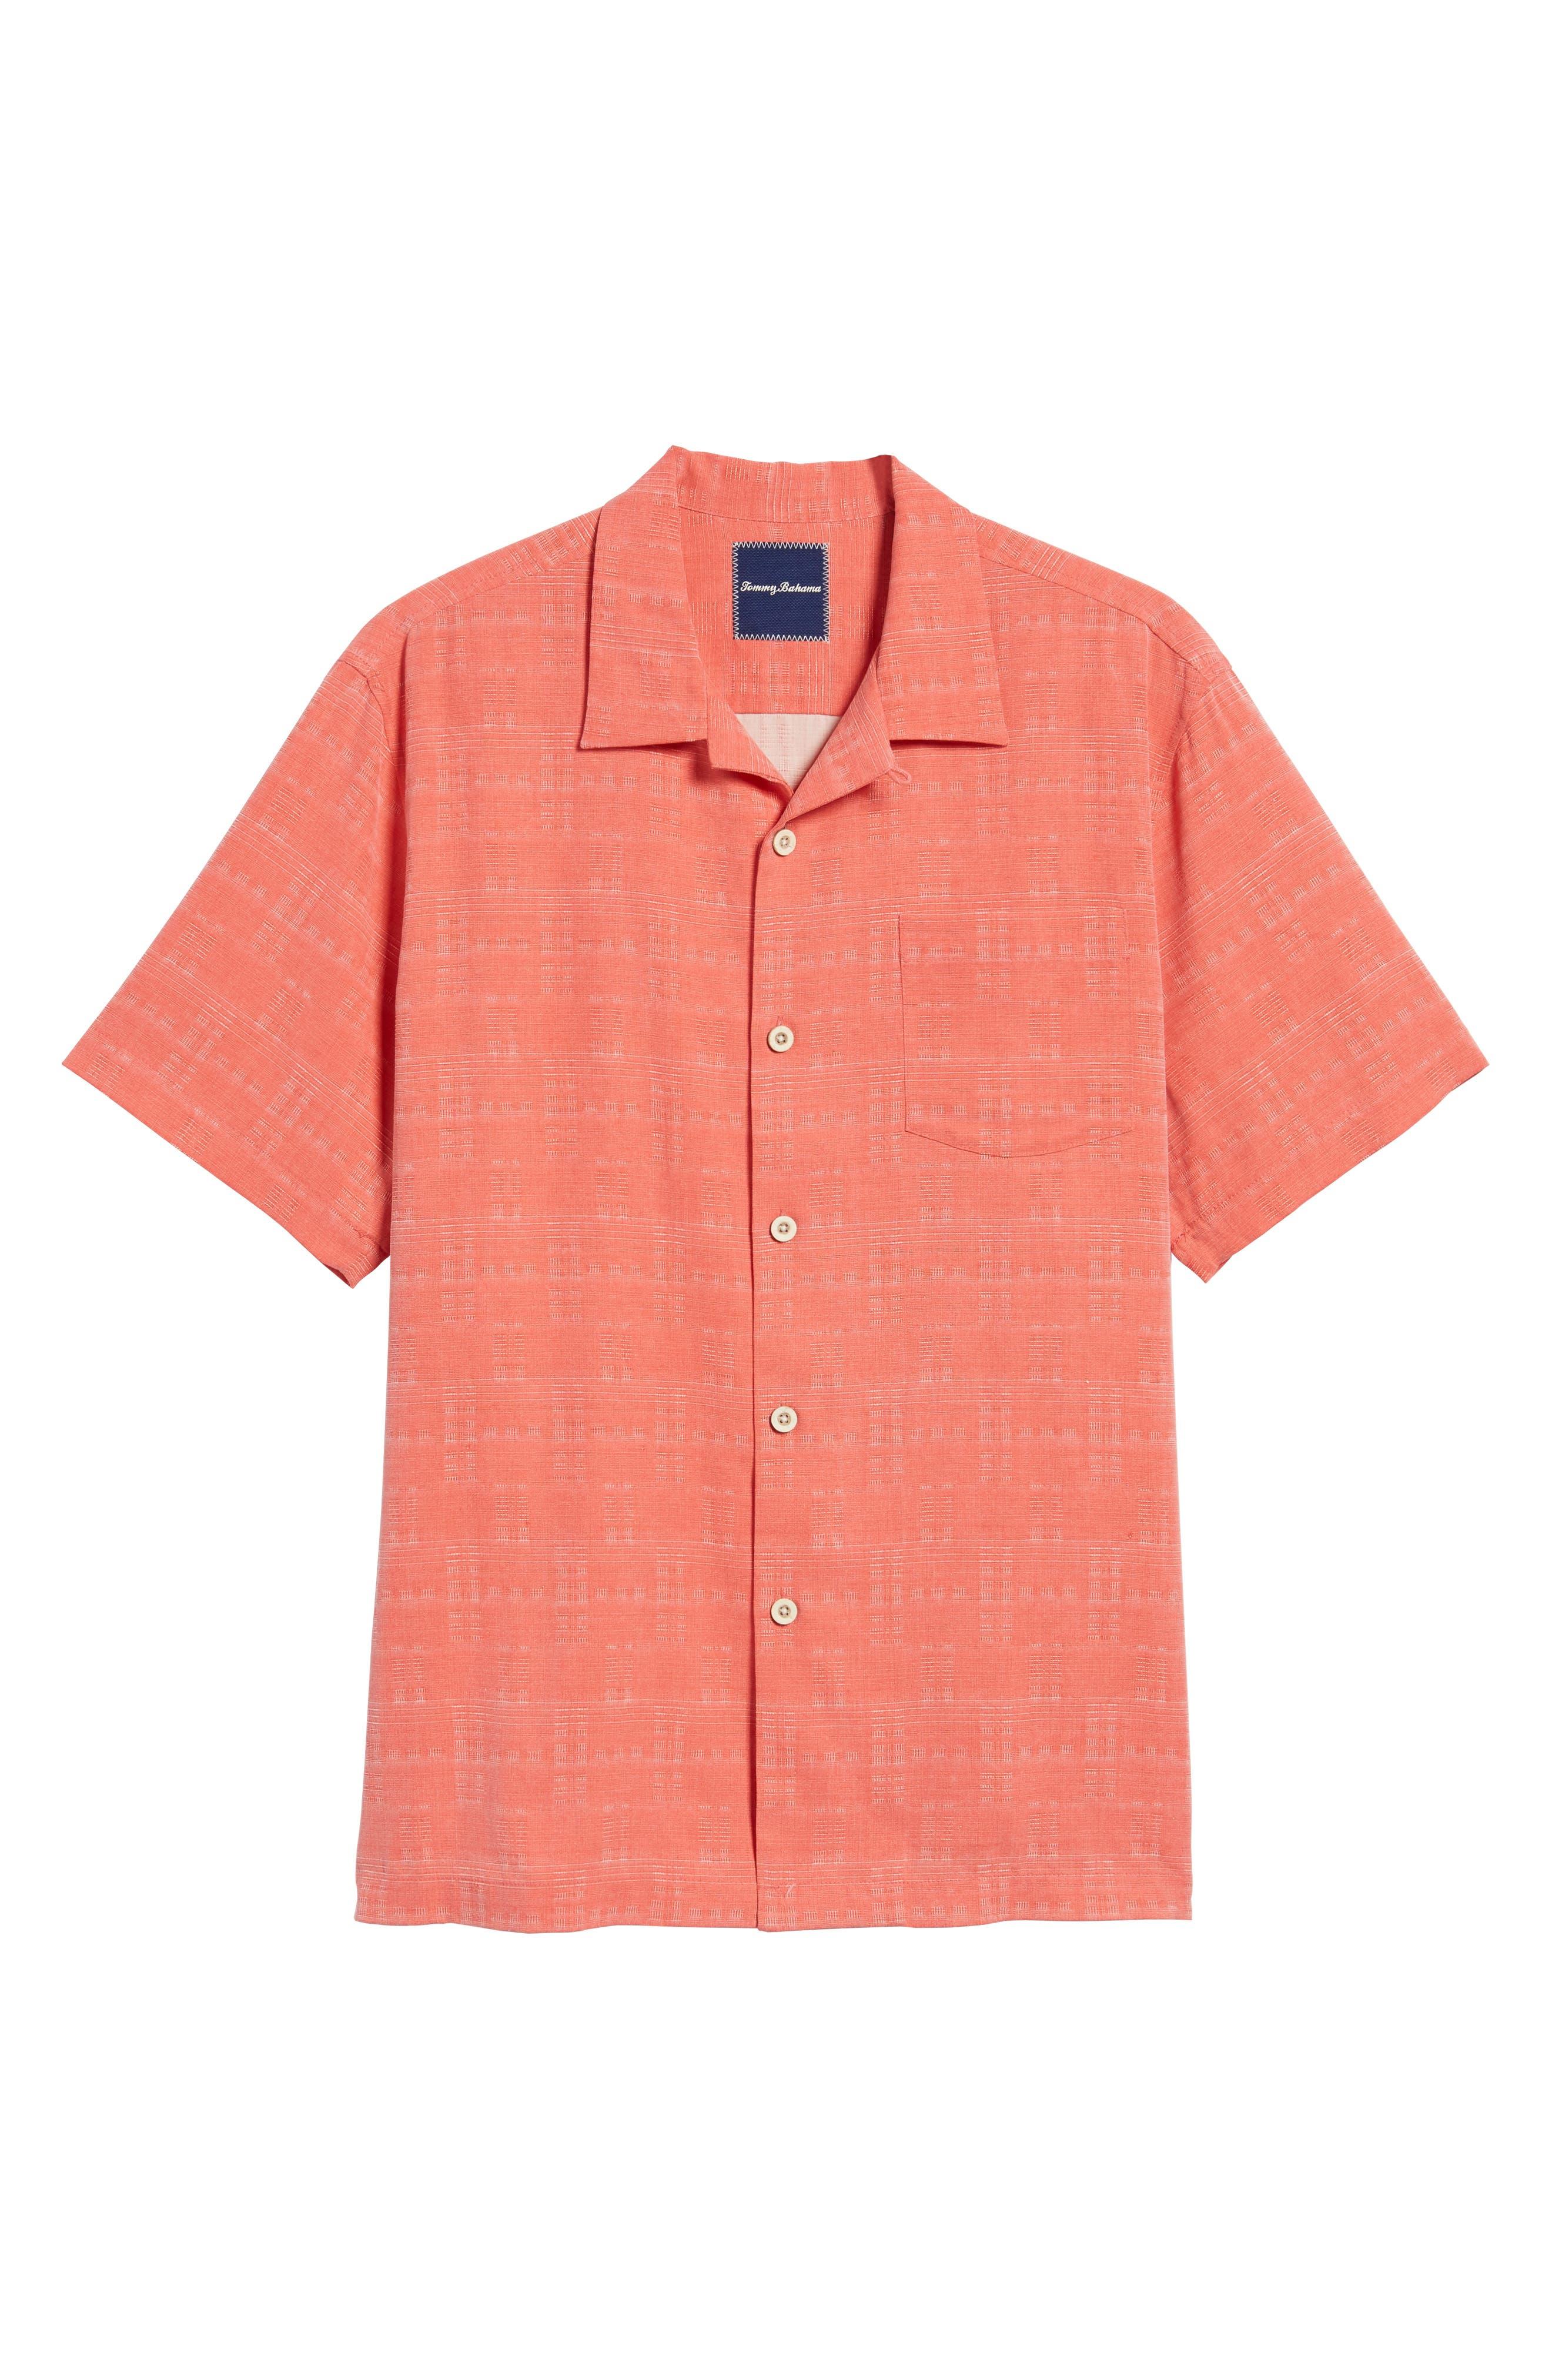 Alternate Image 1 Selected - Tommy Bahama 'Geo-Rific Jacquard' Original Fit Silk Camp Shirt